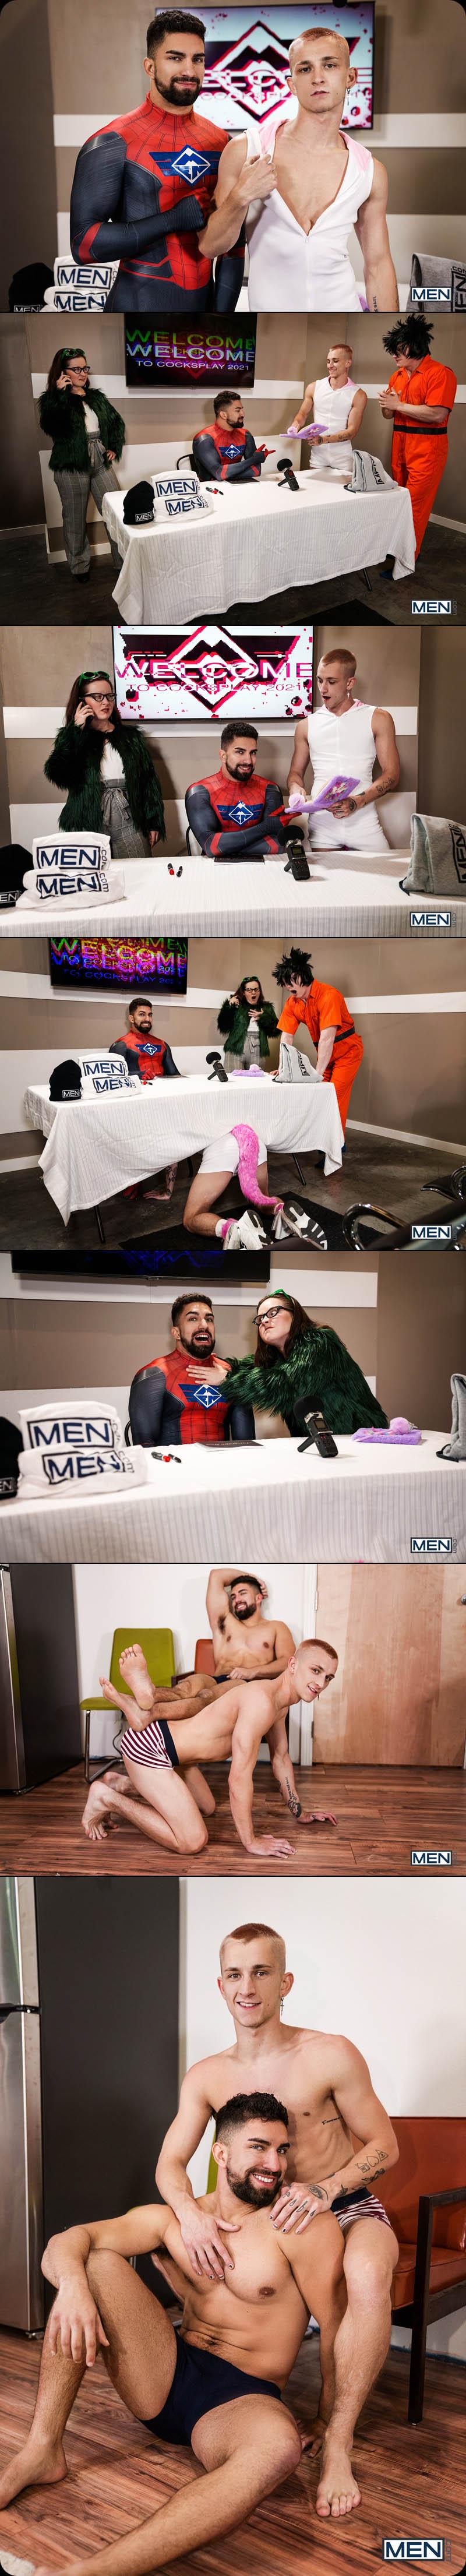 Cocksplay, Part 1 (Superhero-Suited Nick LA Fucks Cosplay Fan Theo Brady) at MEN.com